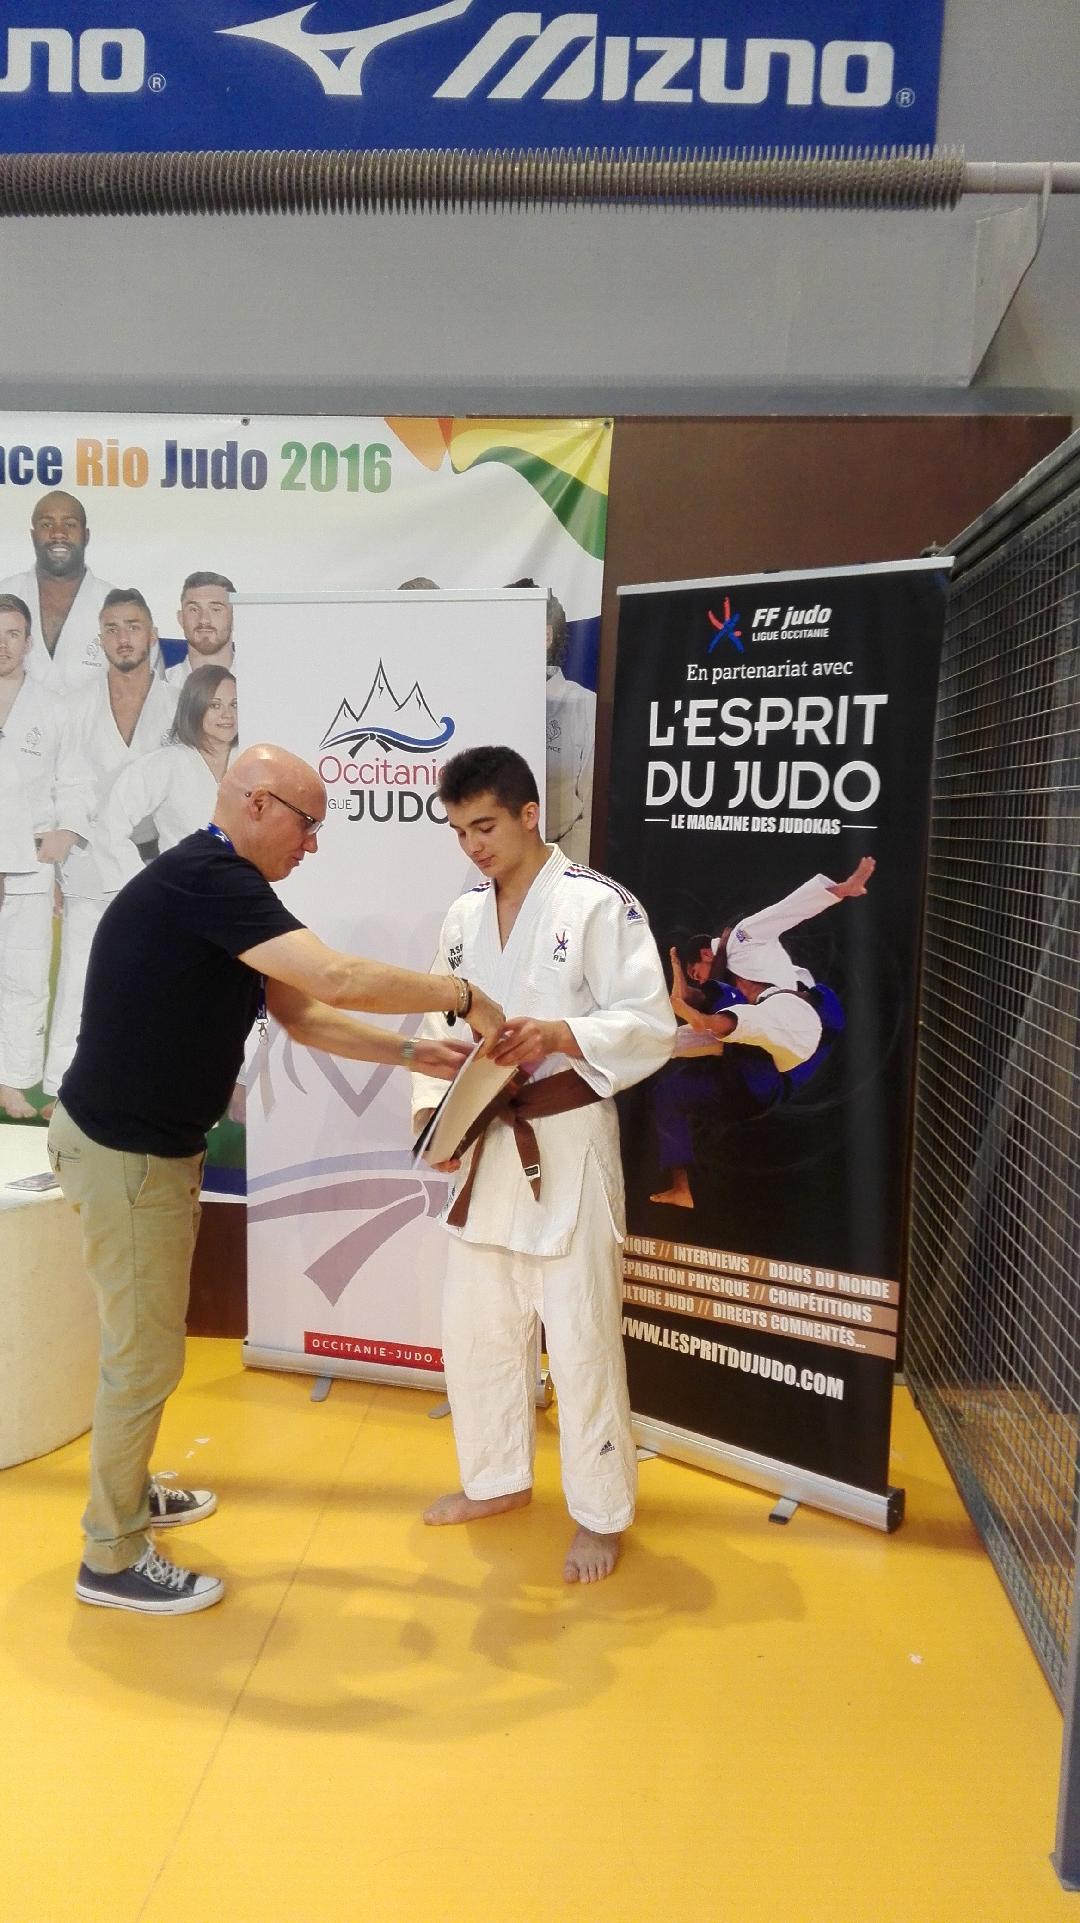 Calendrier Judo Occitanie.Hugo Winter Ceinture Noire De Judo Montpellier